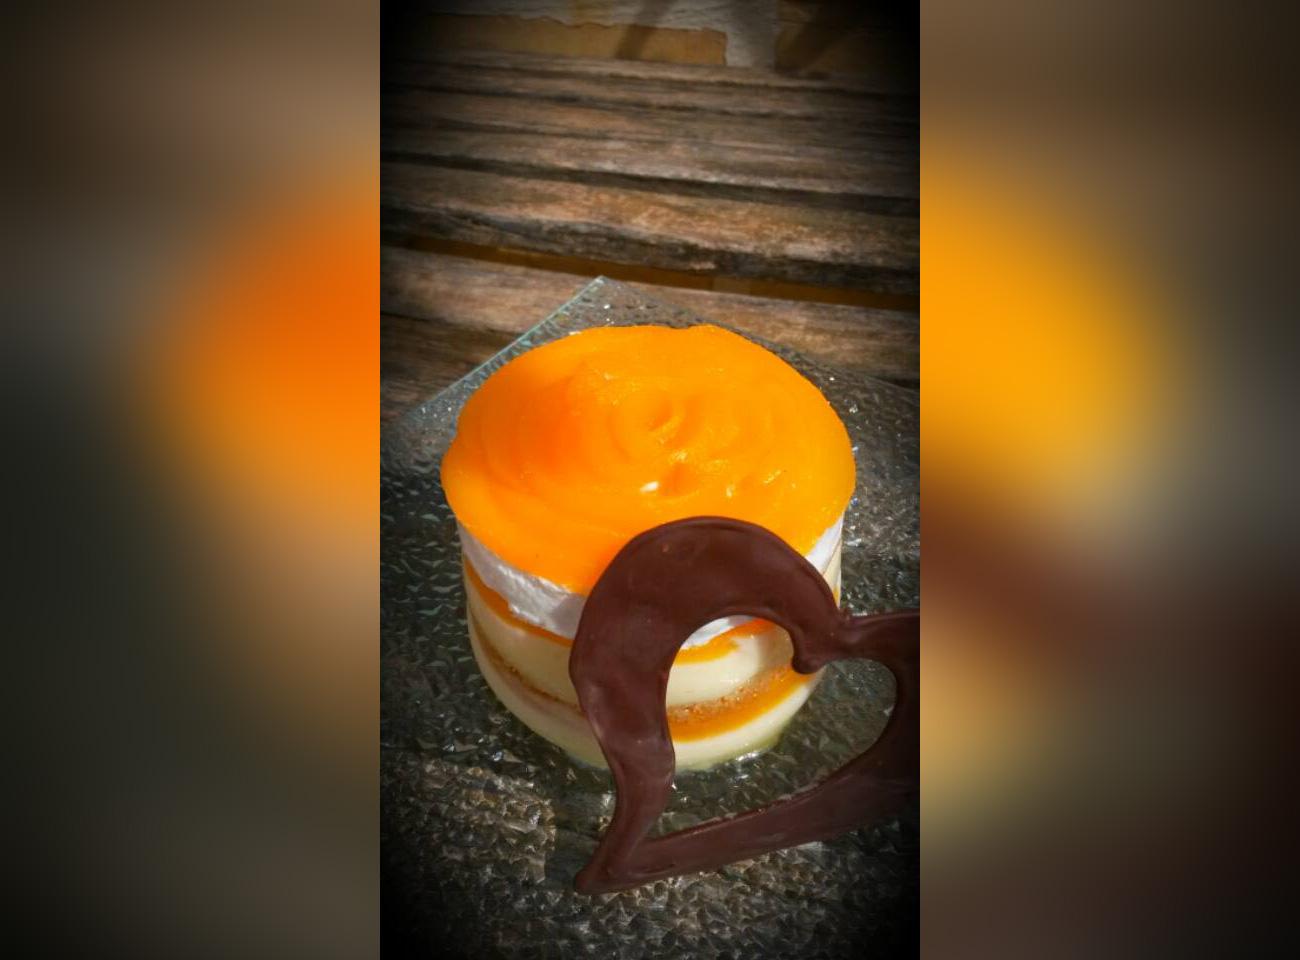 Peach sponge and cream cake by Stephanie Curmi